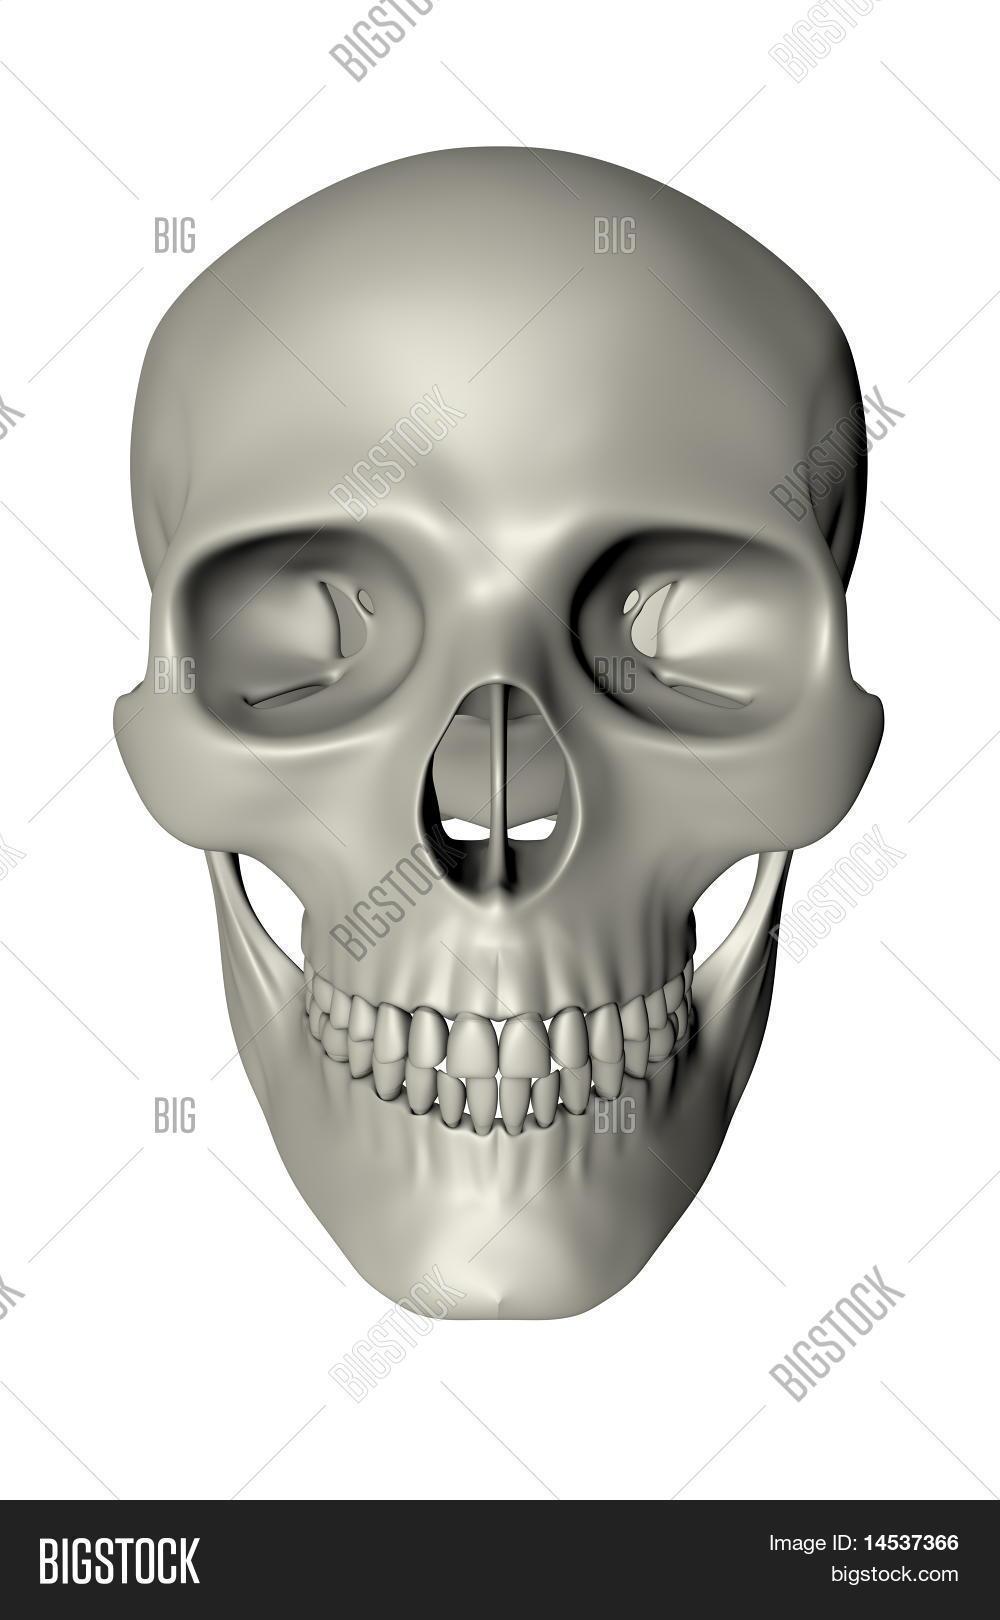 Human Skull Front Image Photo Free Trial Bigstock